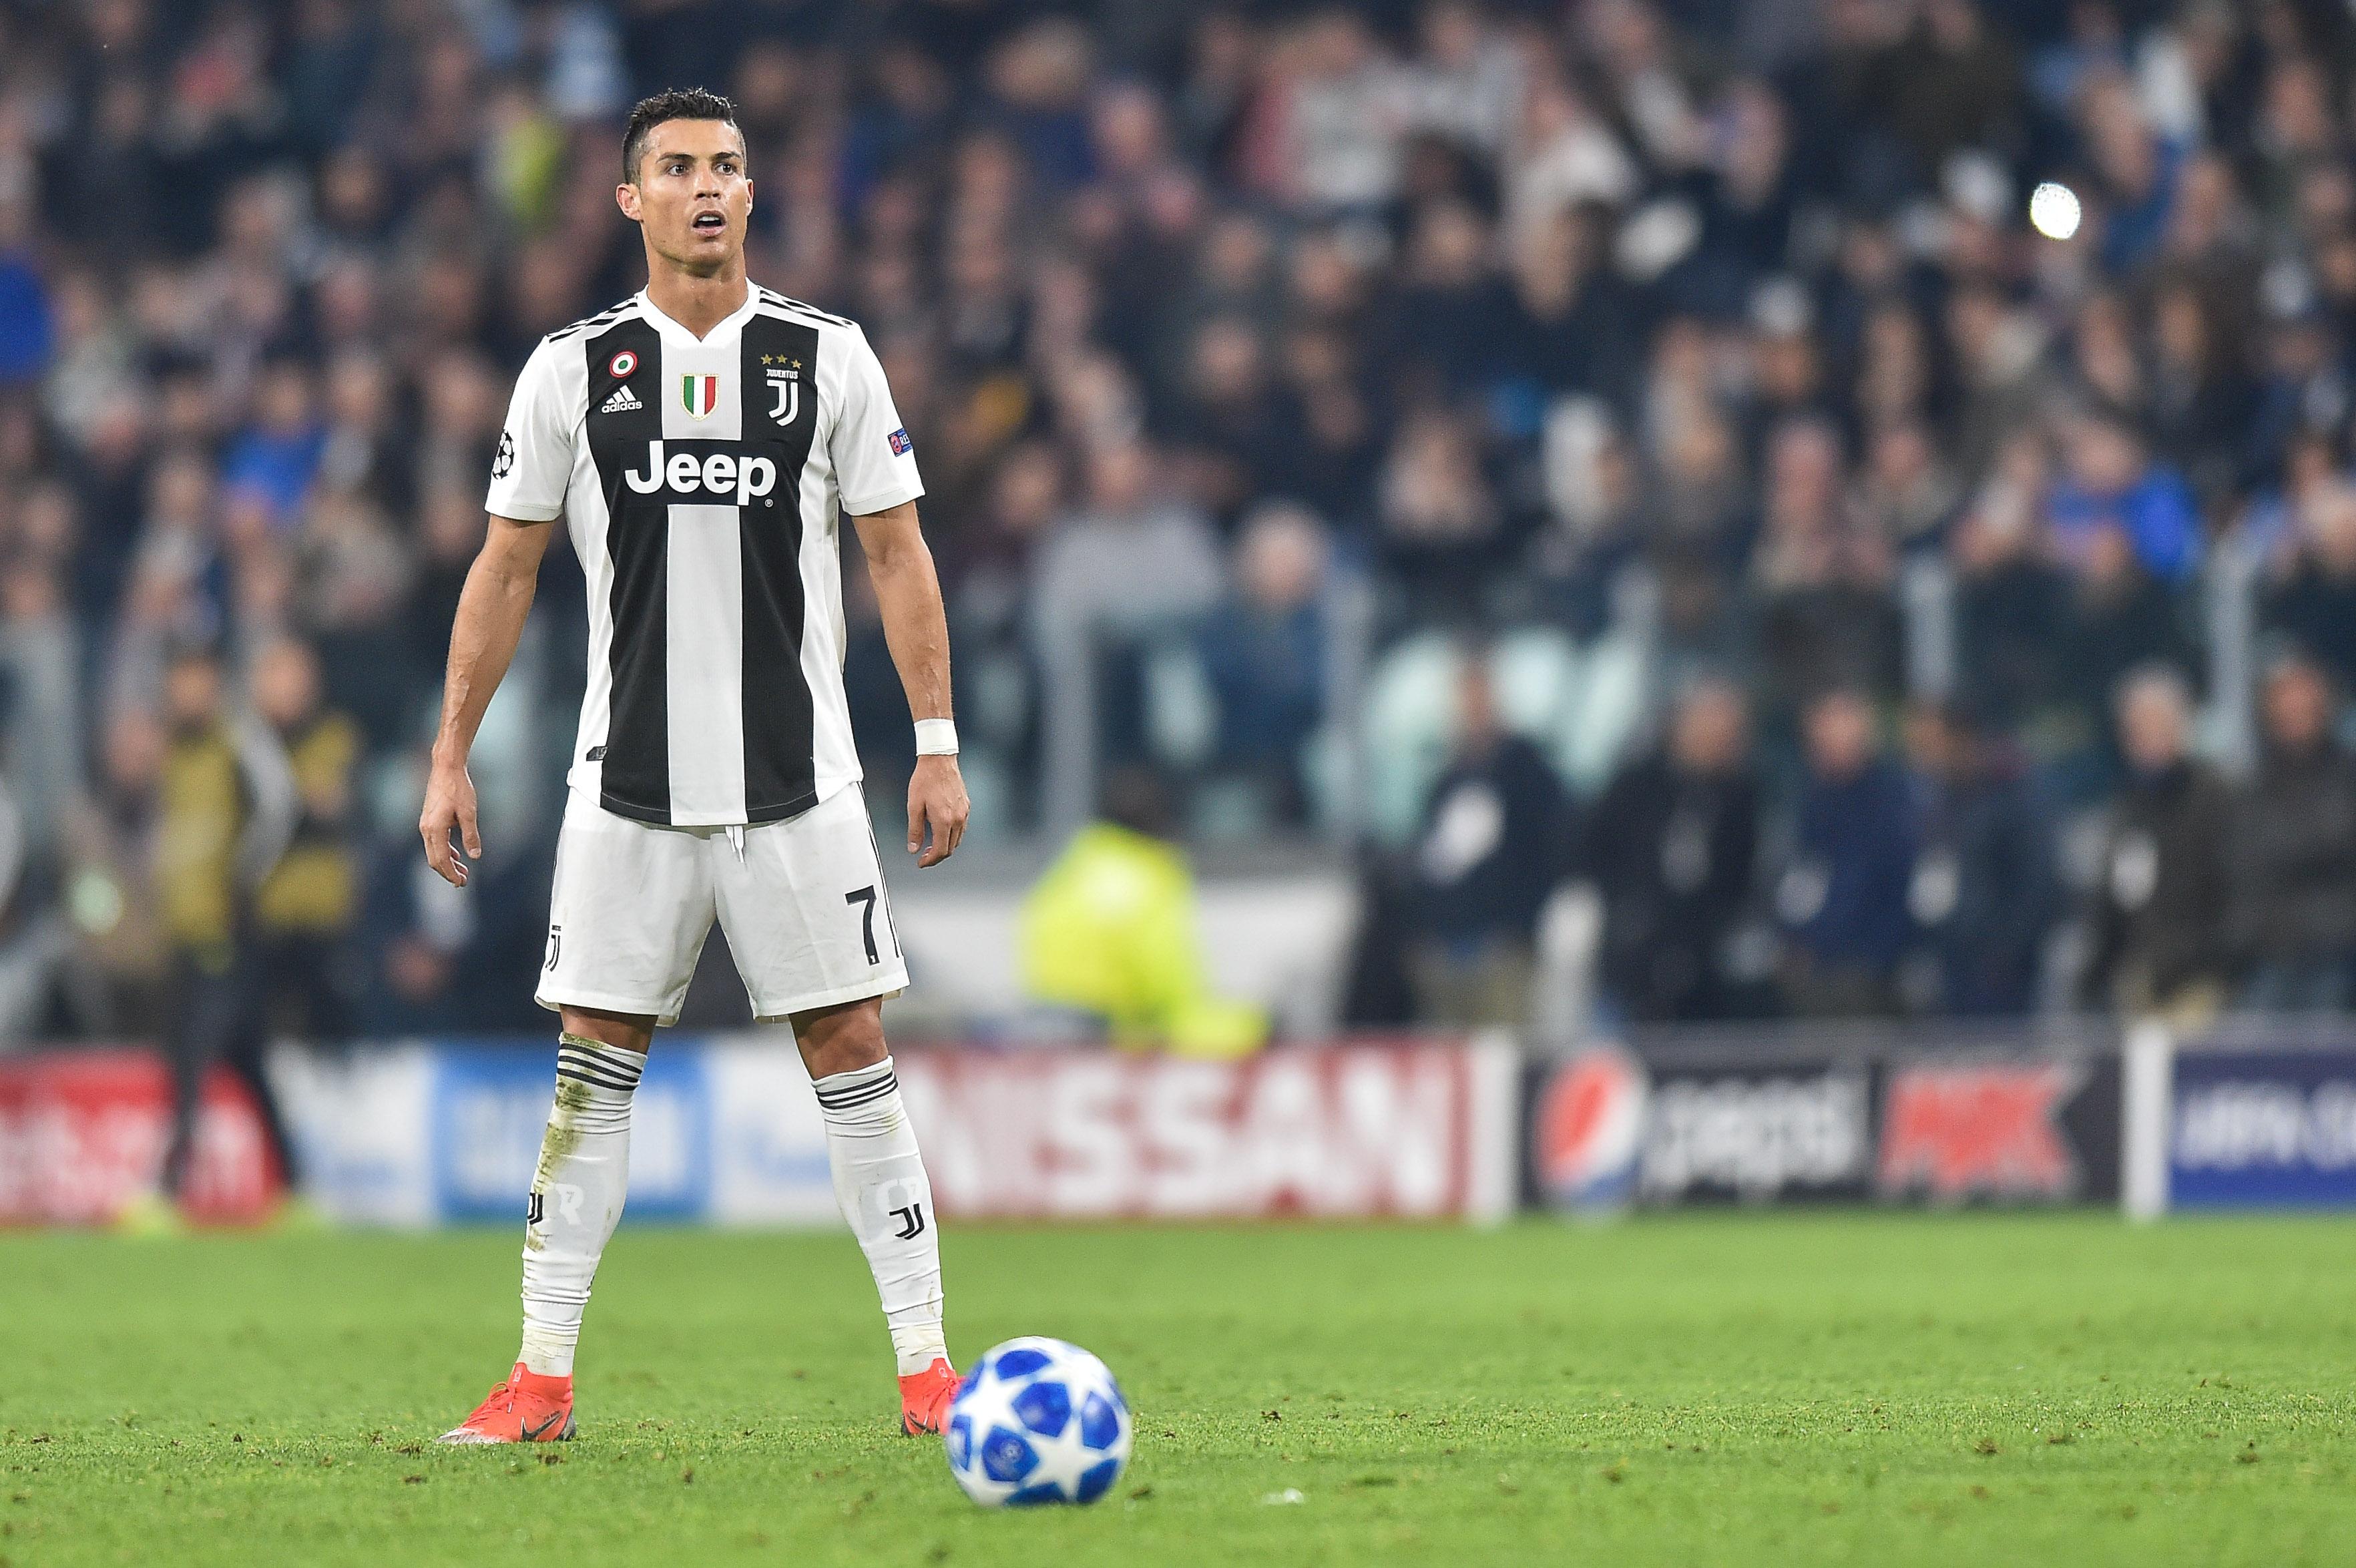 2018.11.07 Turyn, Liga Mistrzow 2018/2019, Juventus Turyn - Manchester United N/z: Cristiano Ronaldo, Foto Lukasz Laskowski / PressFocus